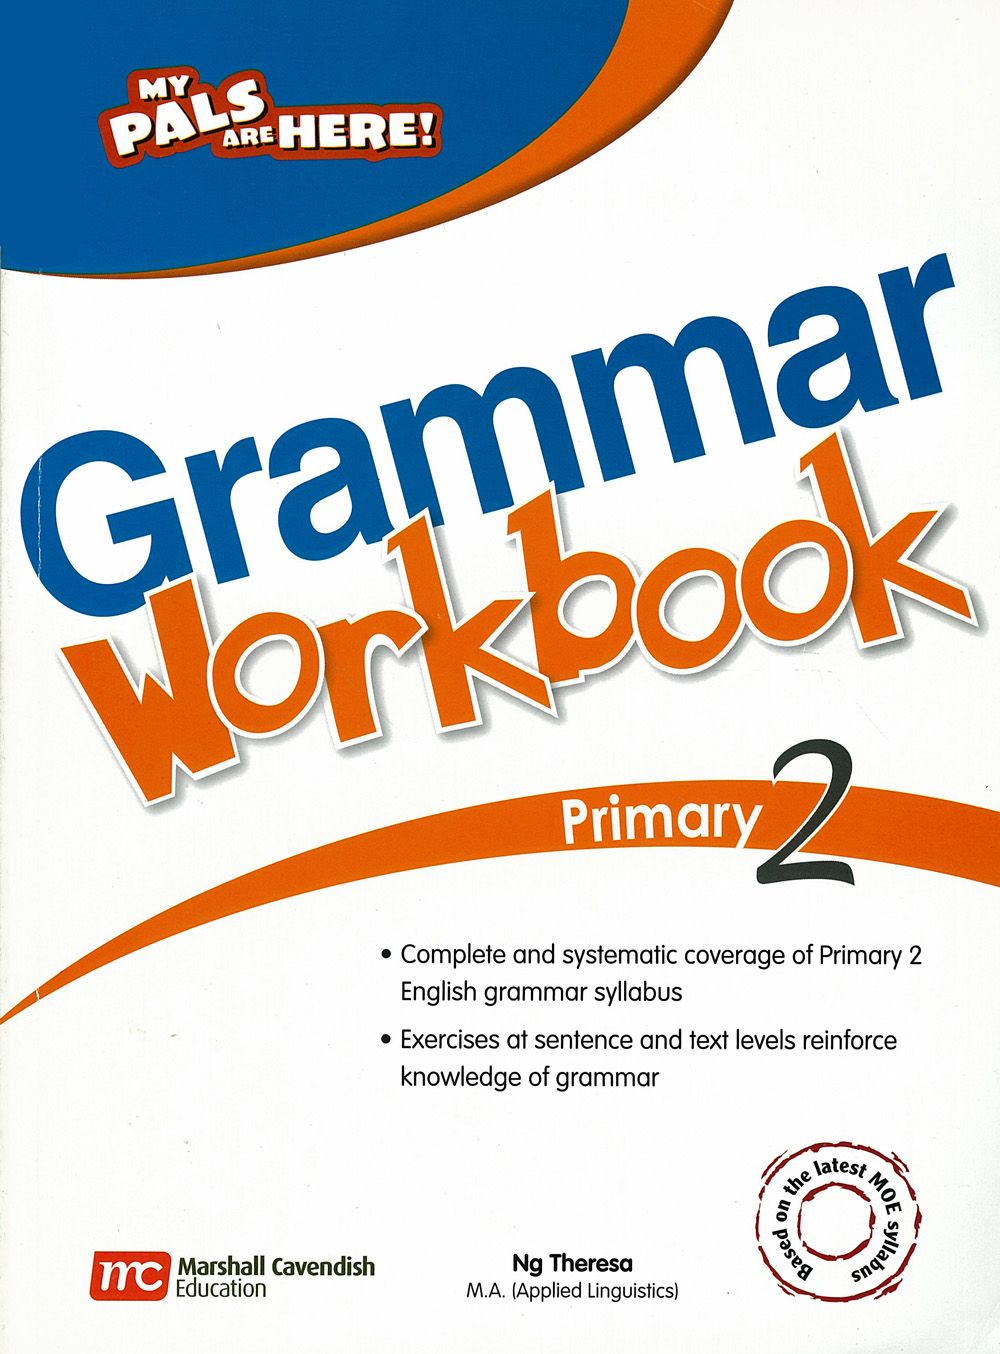 My Pals are Here! Grammar Workbook Primary 2 | piggy | English